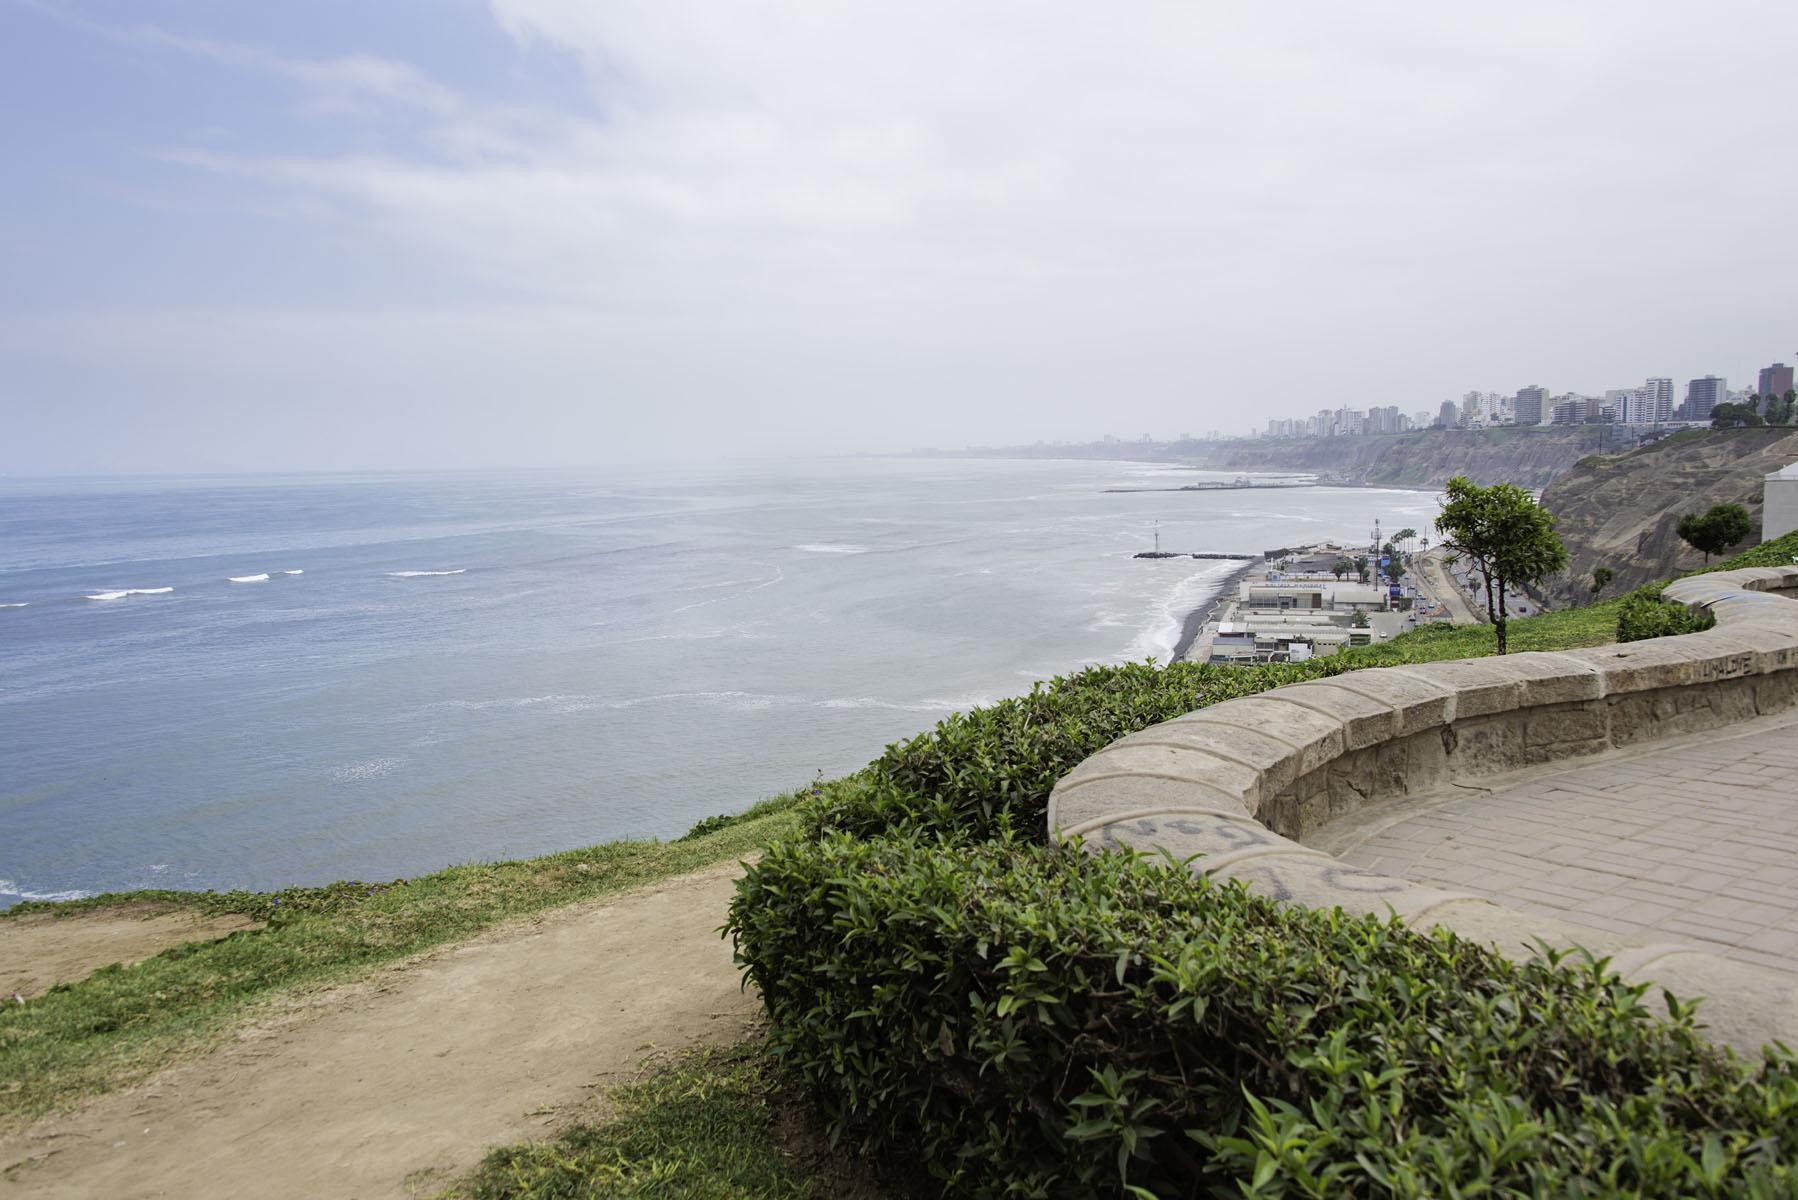 Ocean View from the Sidewalk in Miraflores Lima Peru